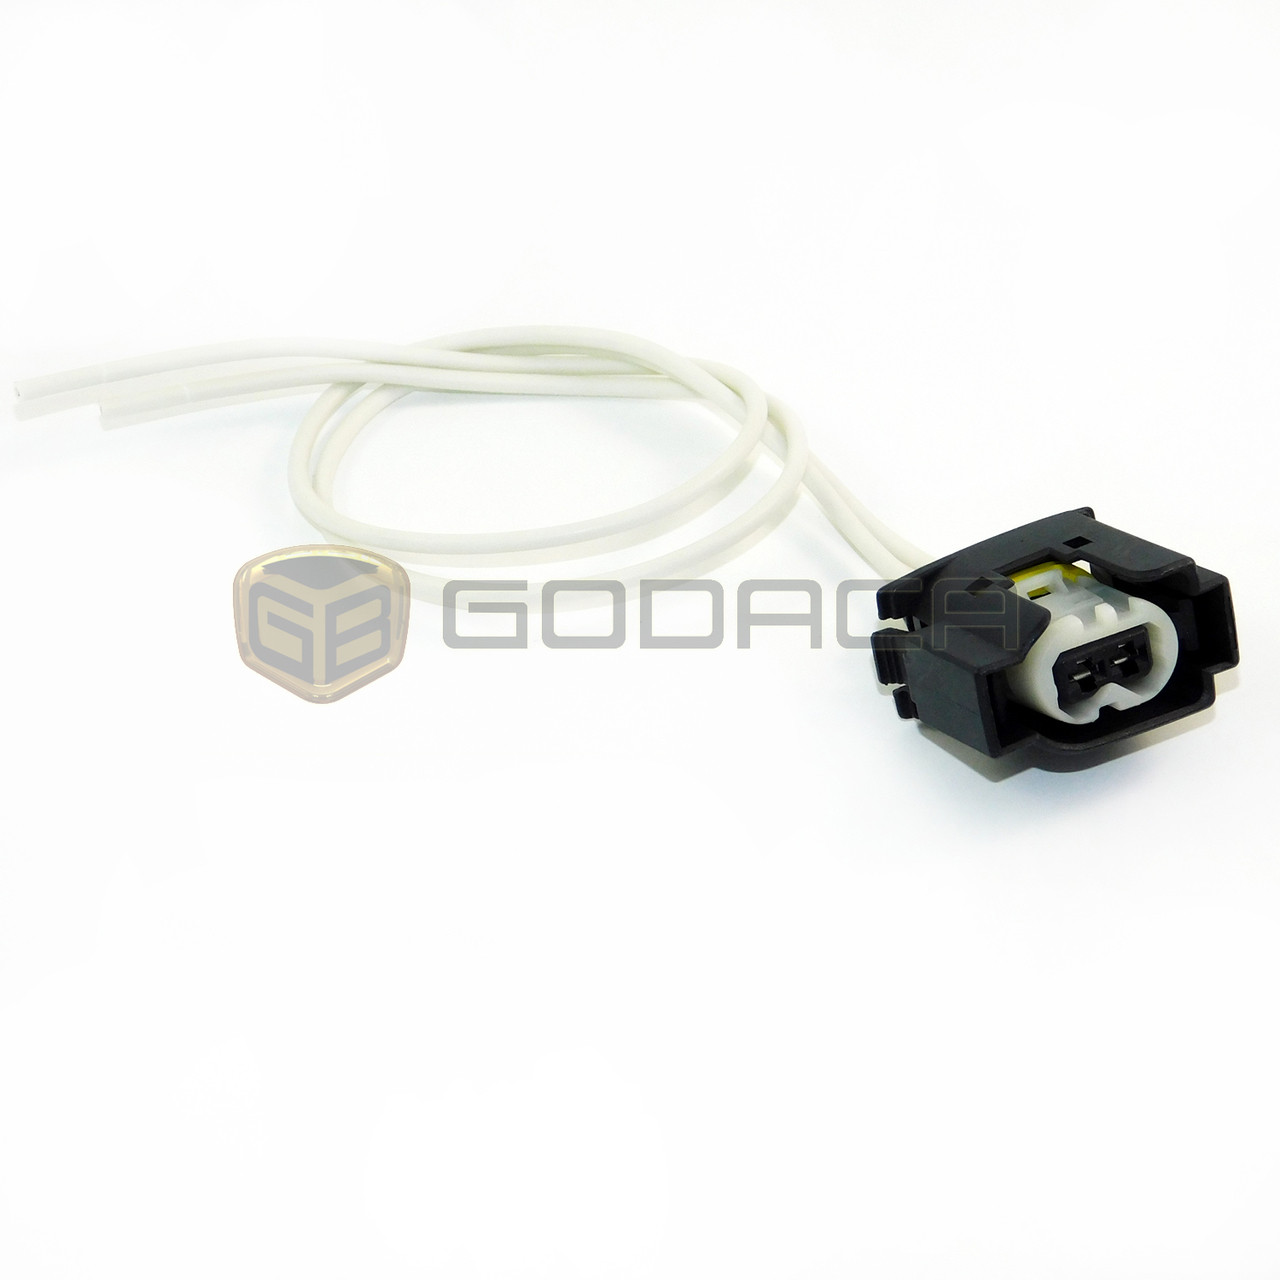 Vw Pat Accelerator Wiring Harness Plug on